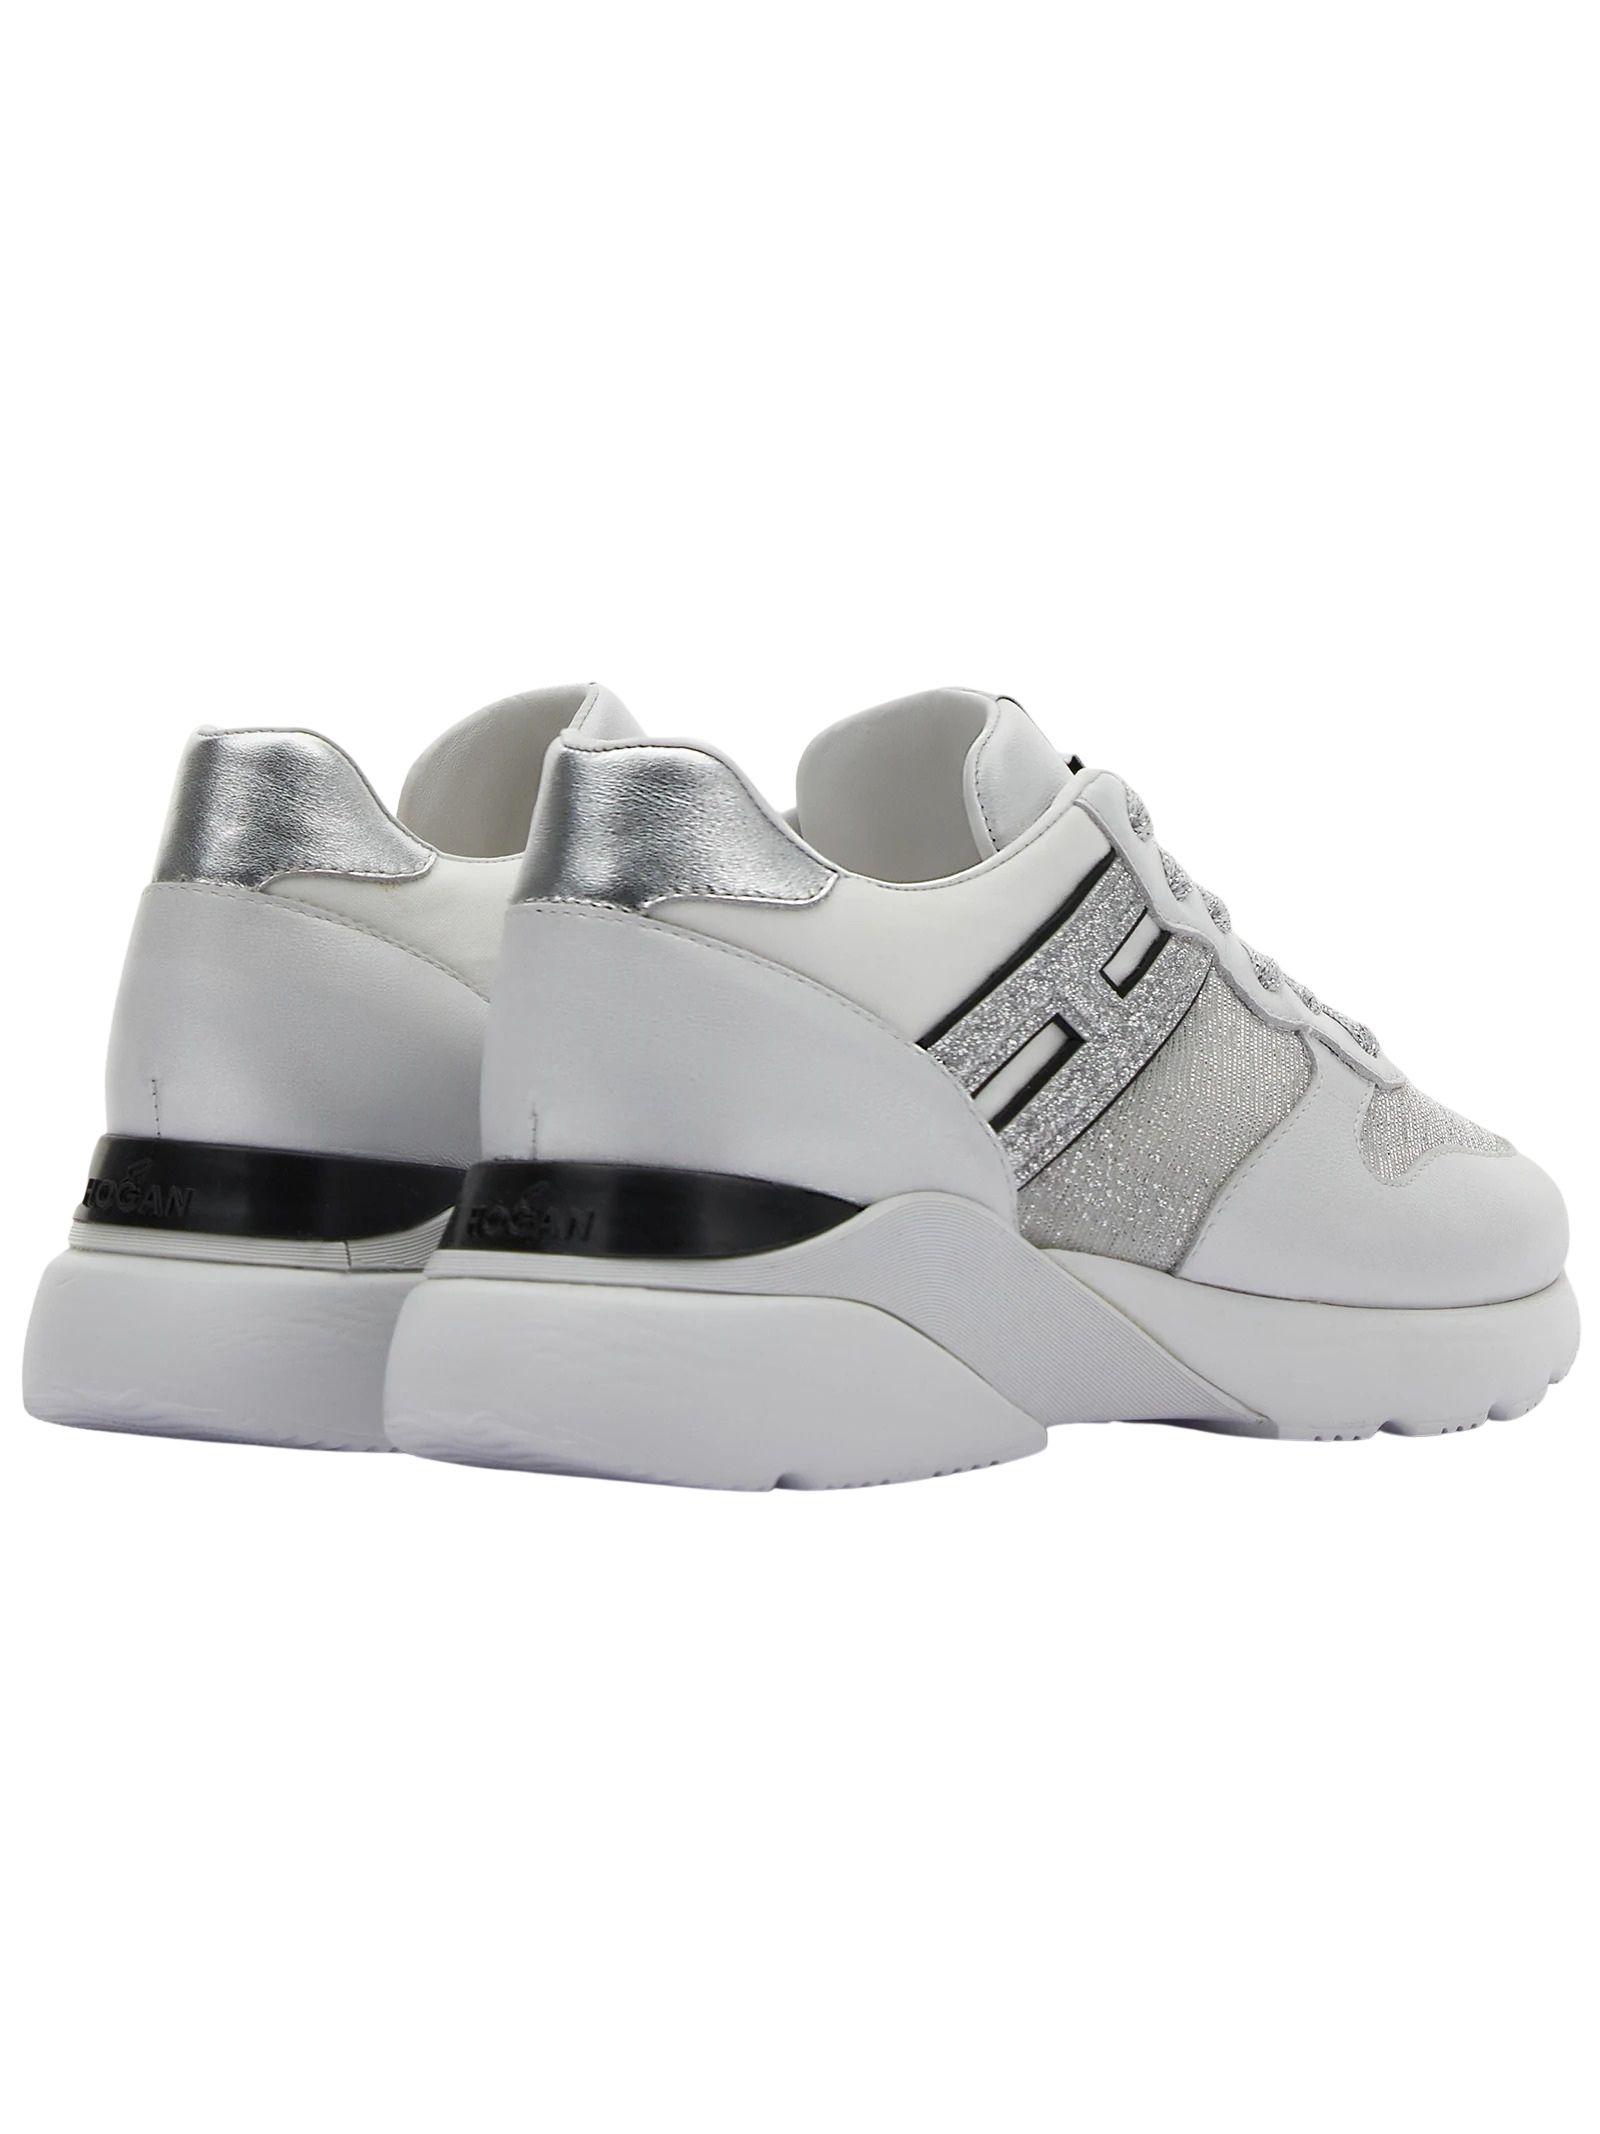 HOGAN | Shoes | HXW3850BF50P9H0RAH